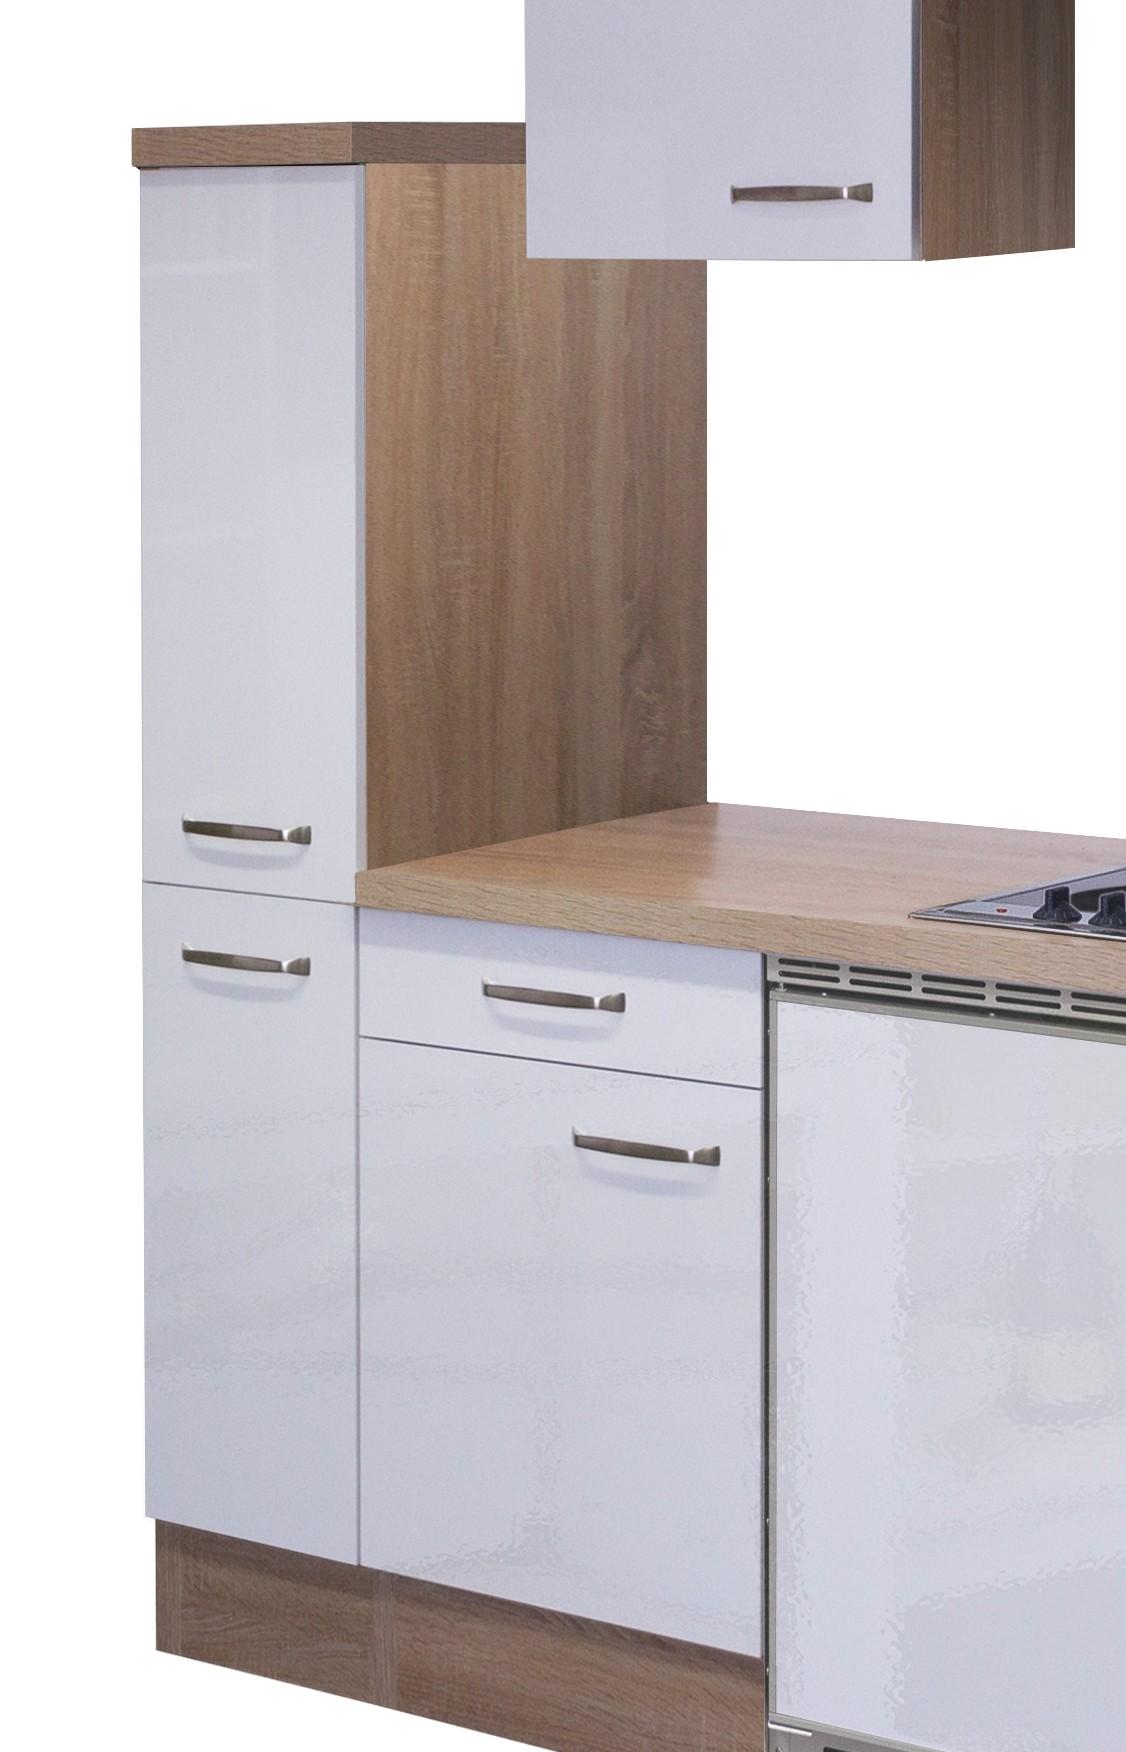 singlek che venedig 10 teilig 180 cm breit wei k che singlek chen. Black Bedroom Furniture Sets. Home Design Ideas